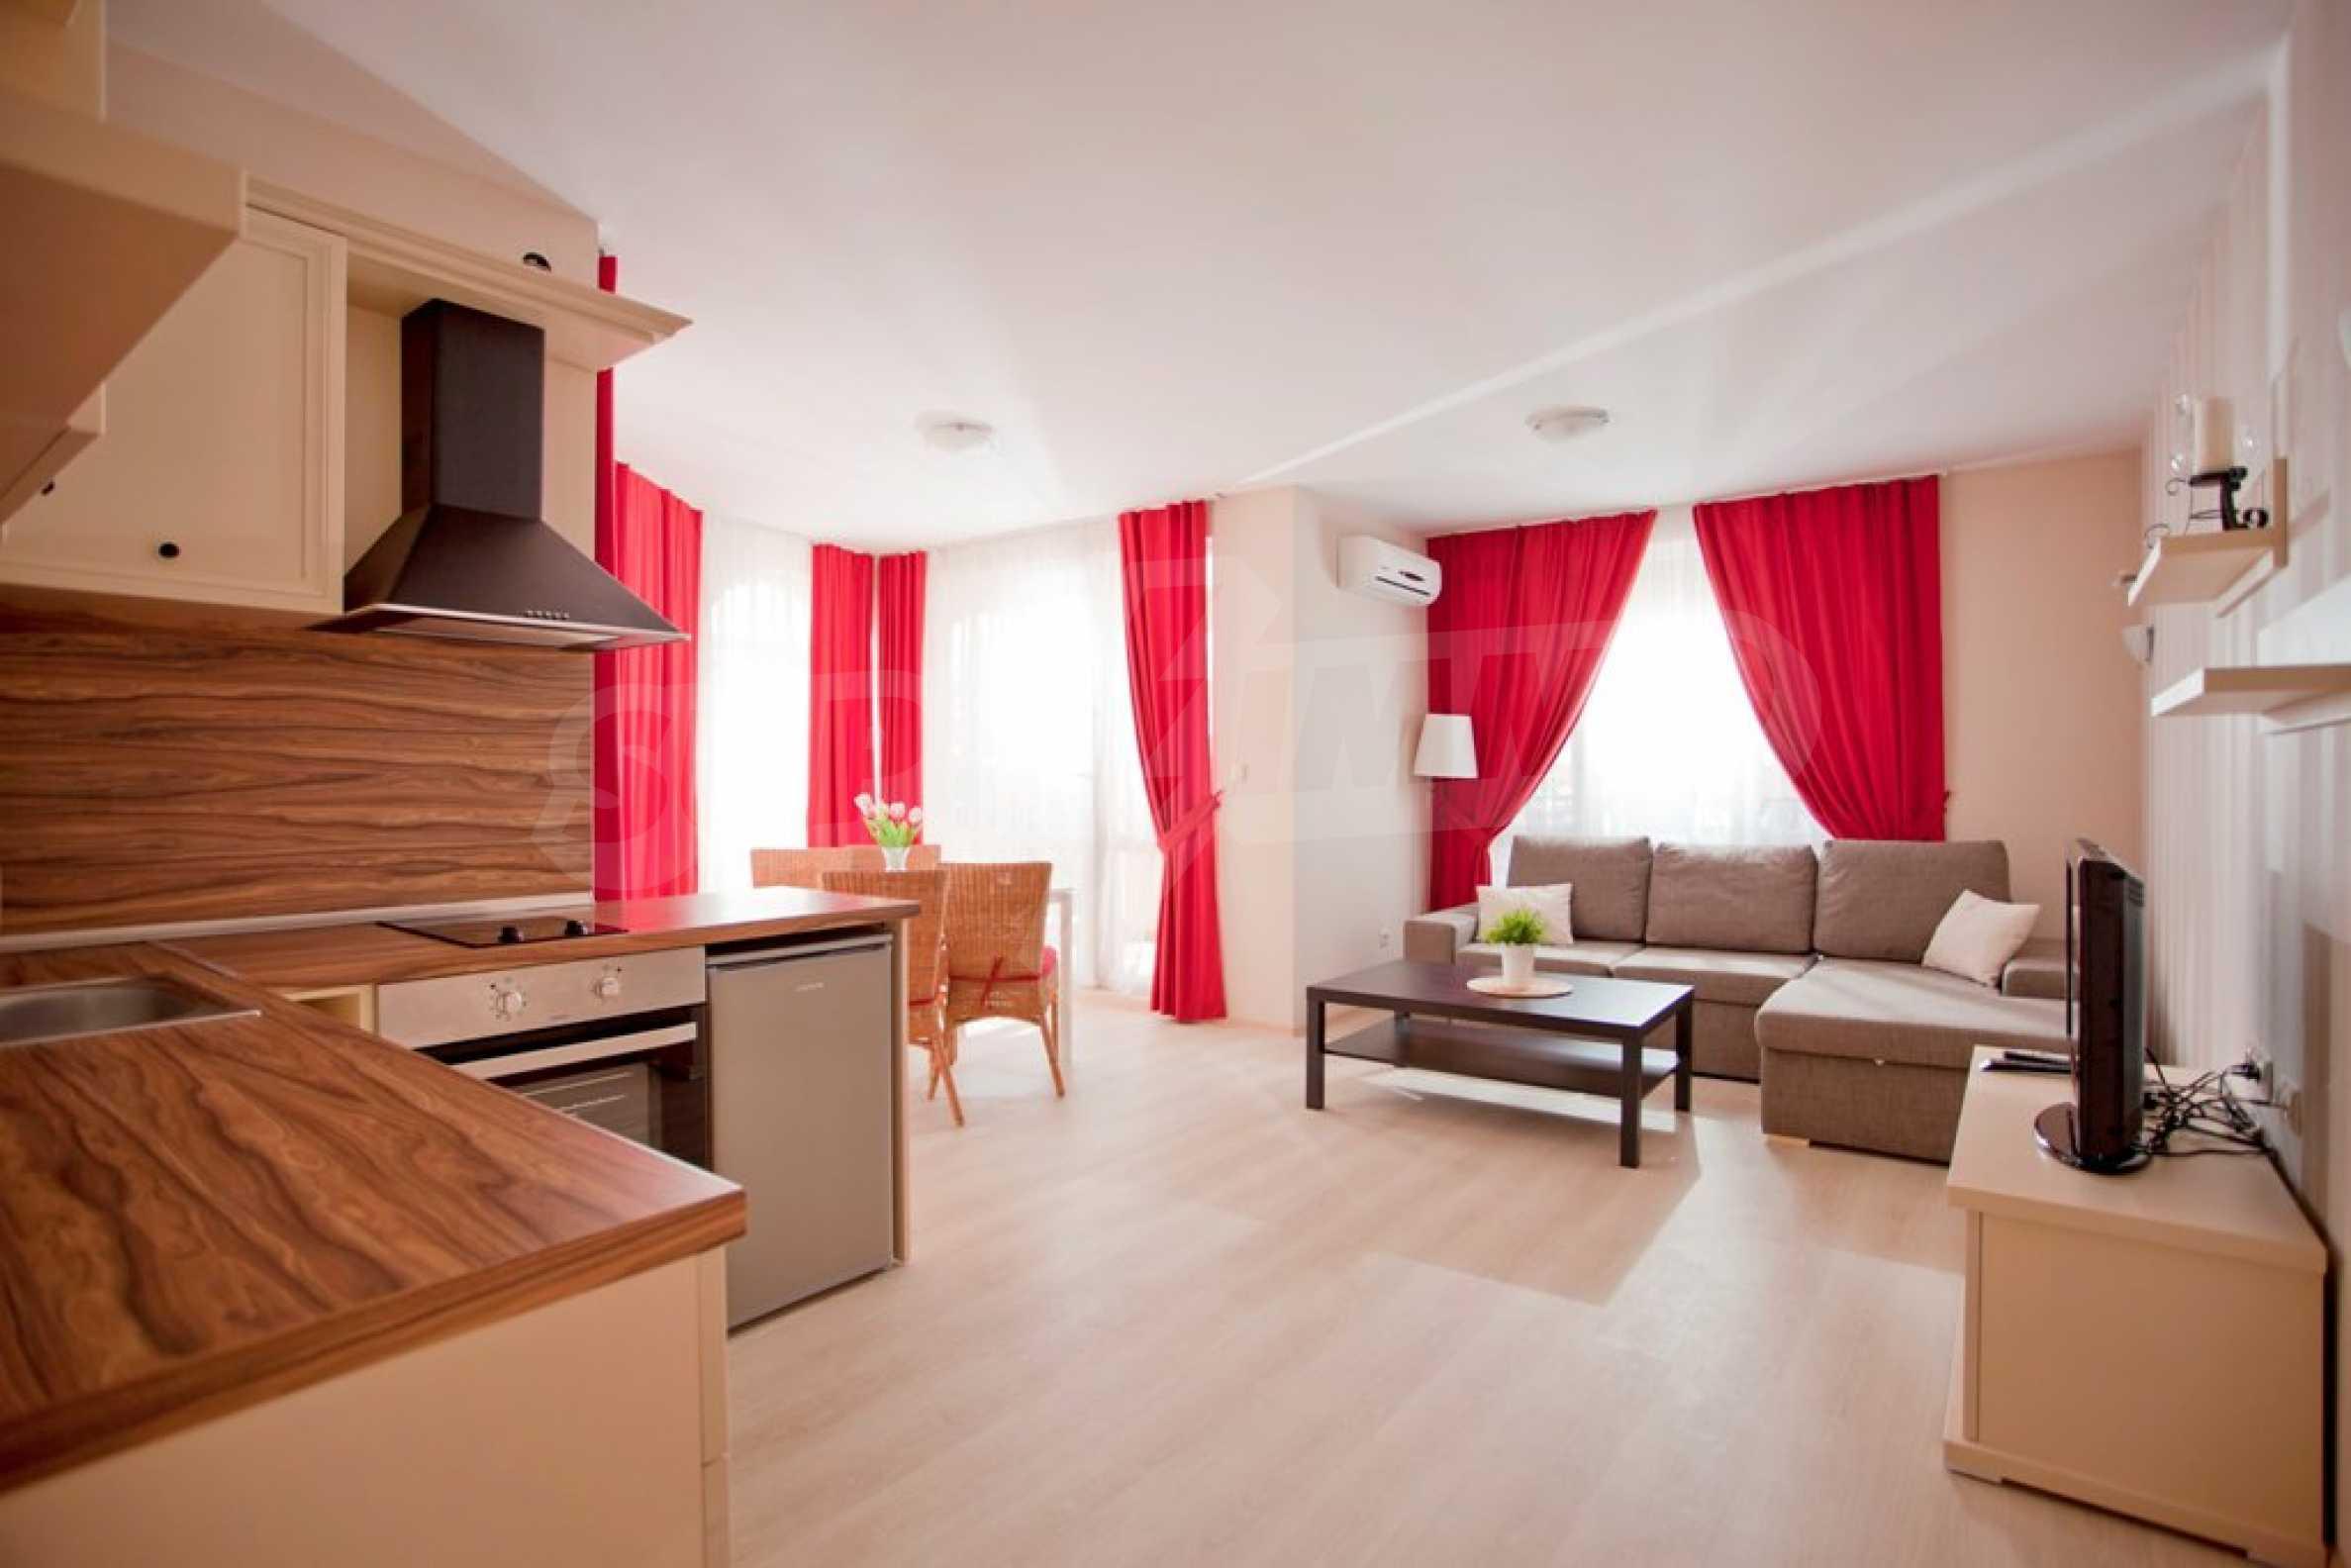 New apartment complex Atia resort in Chernomorets 24